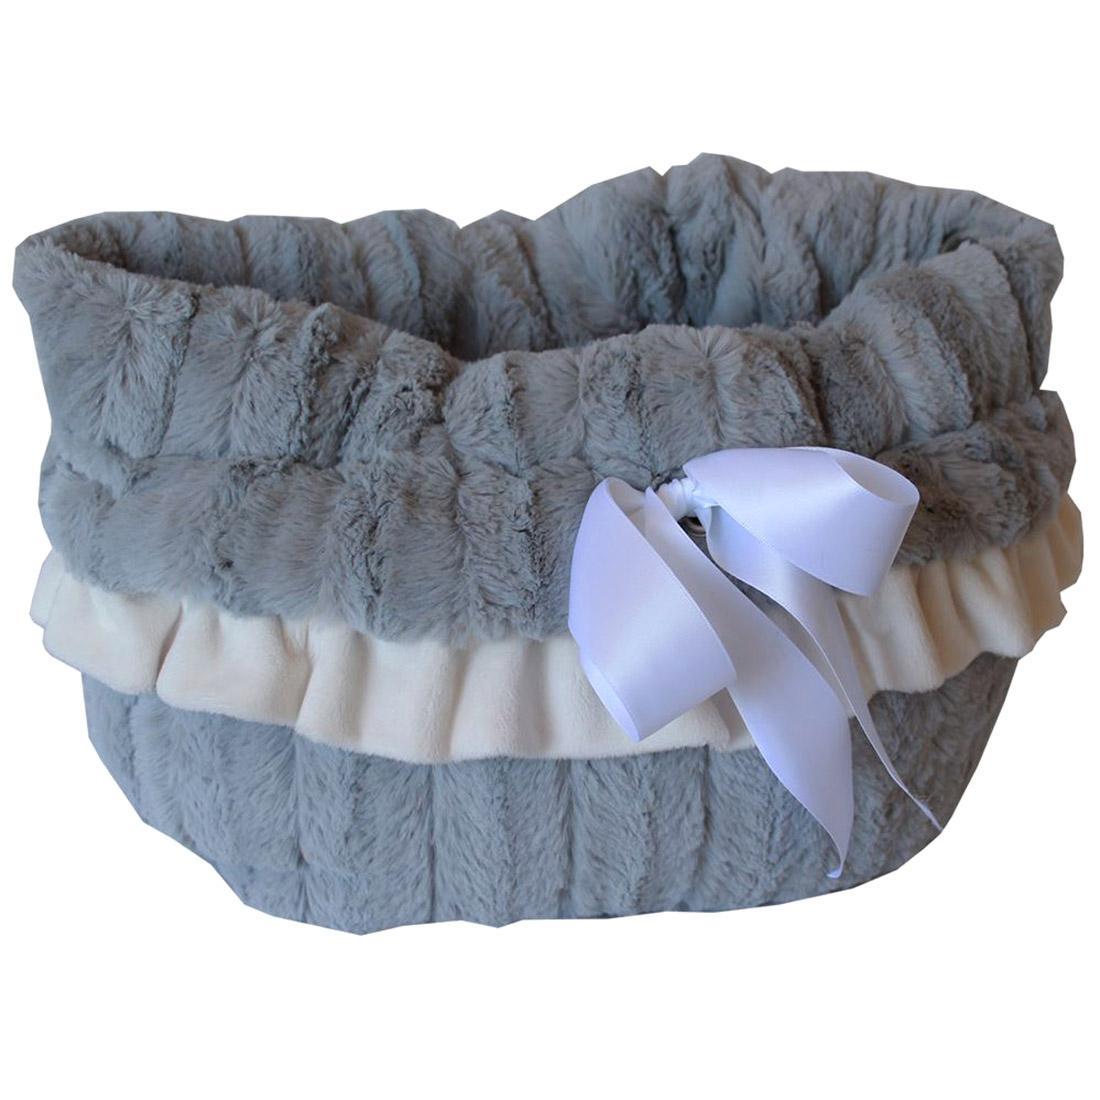 Reversible Snuggle Bugs Pet Bed, Bag, and Car Seat - Gray